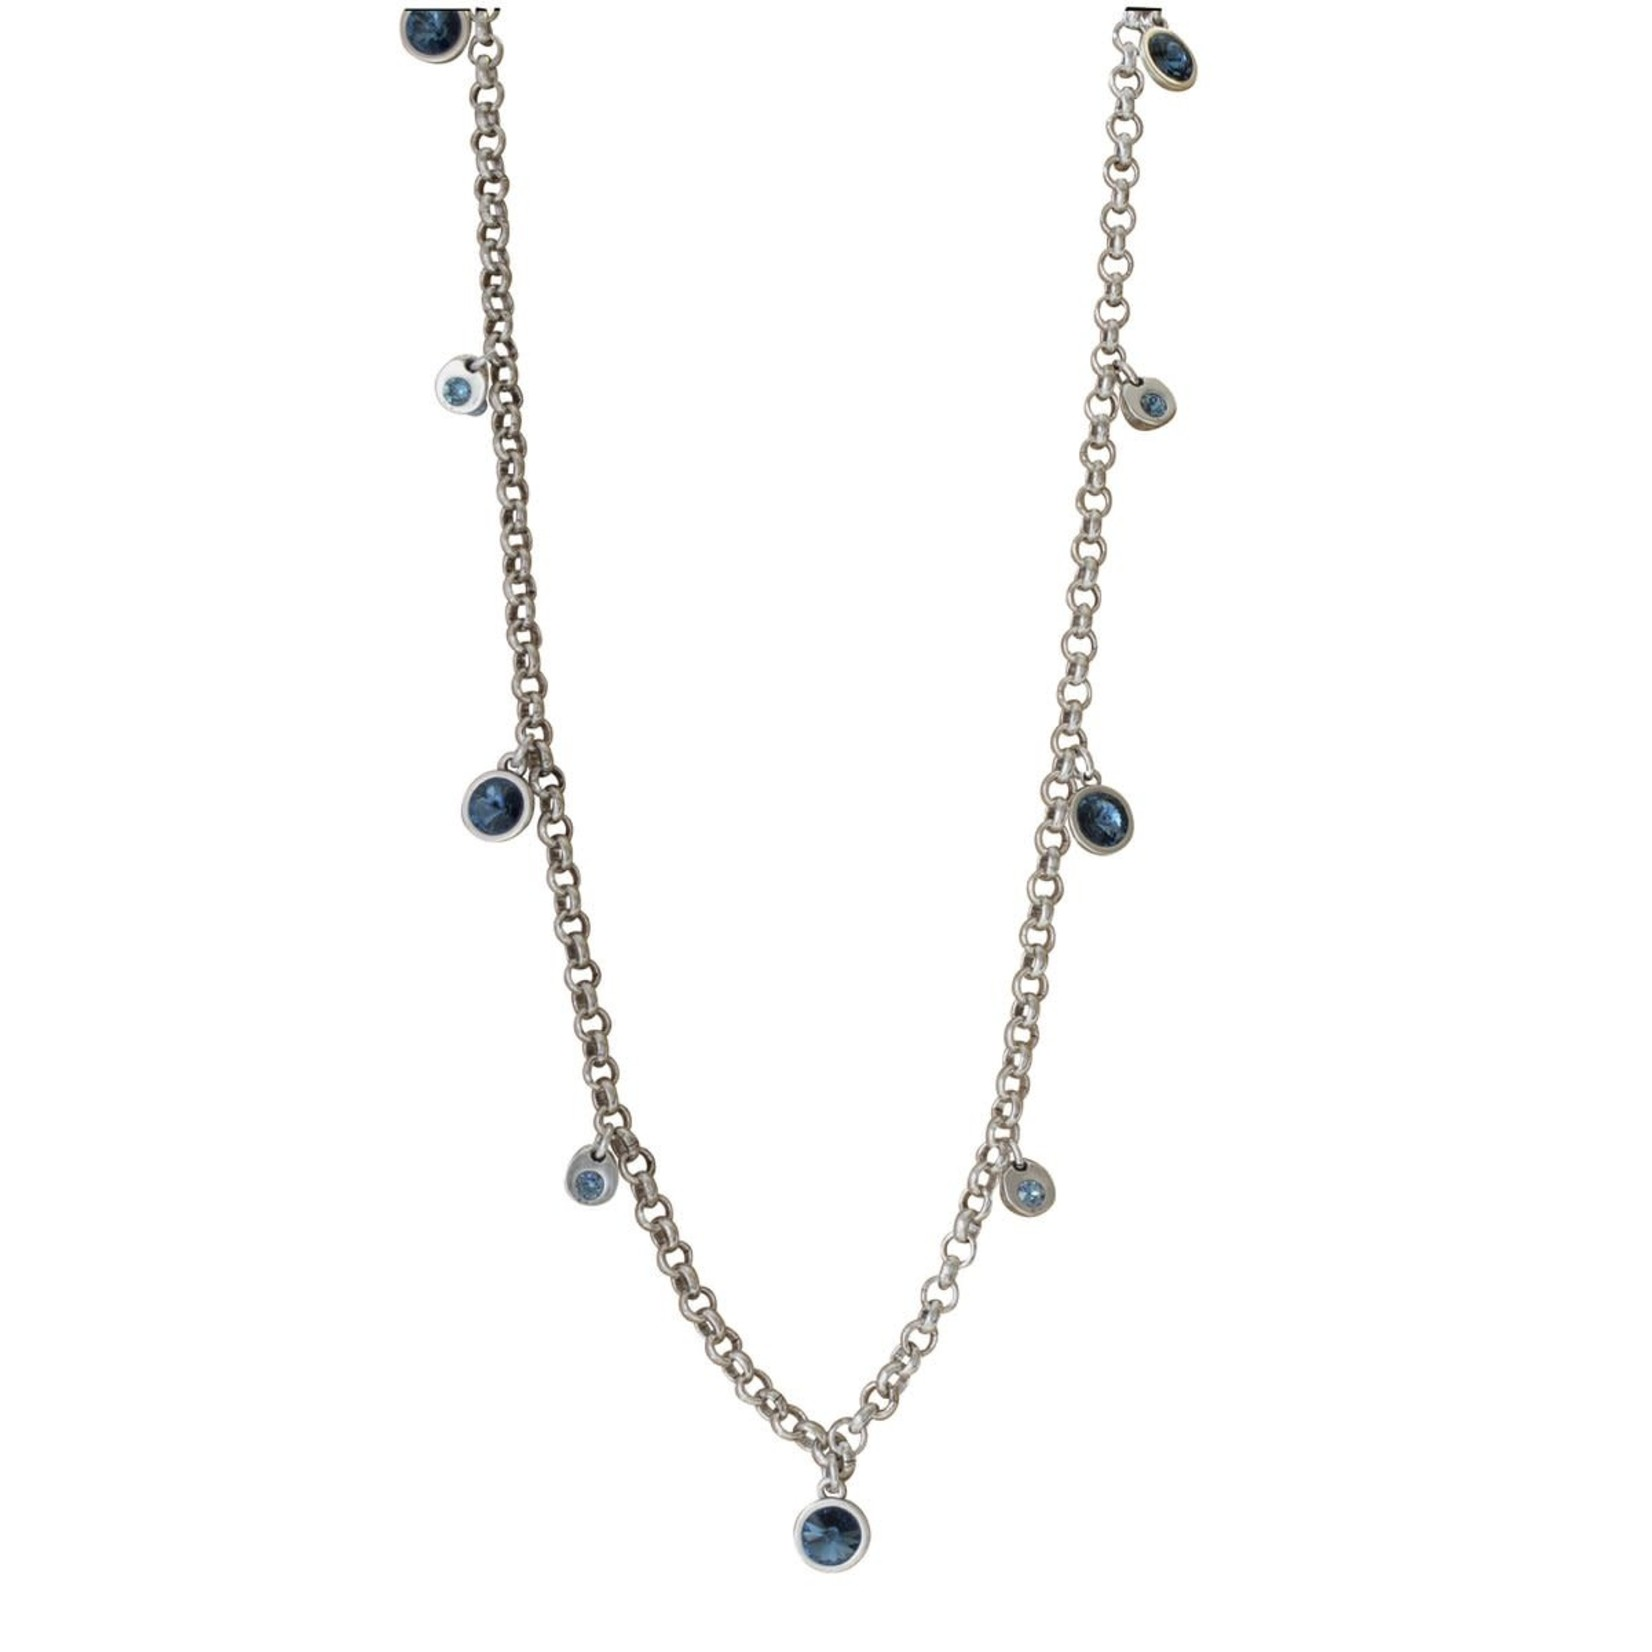 Necklace/Deva/Denim Blue Crystals/Long